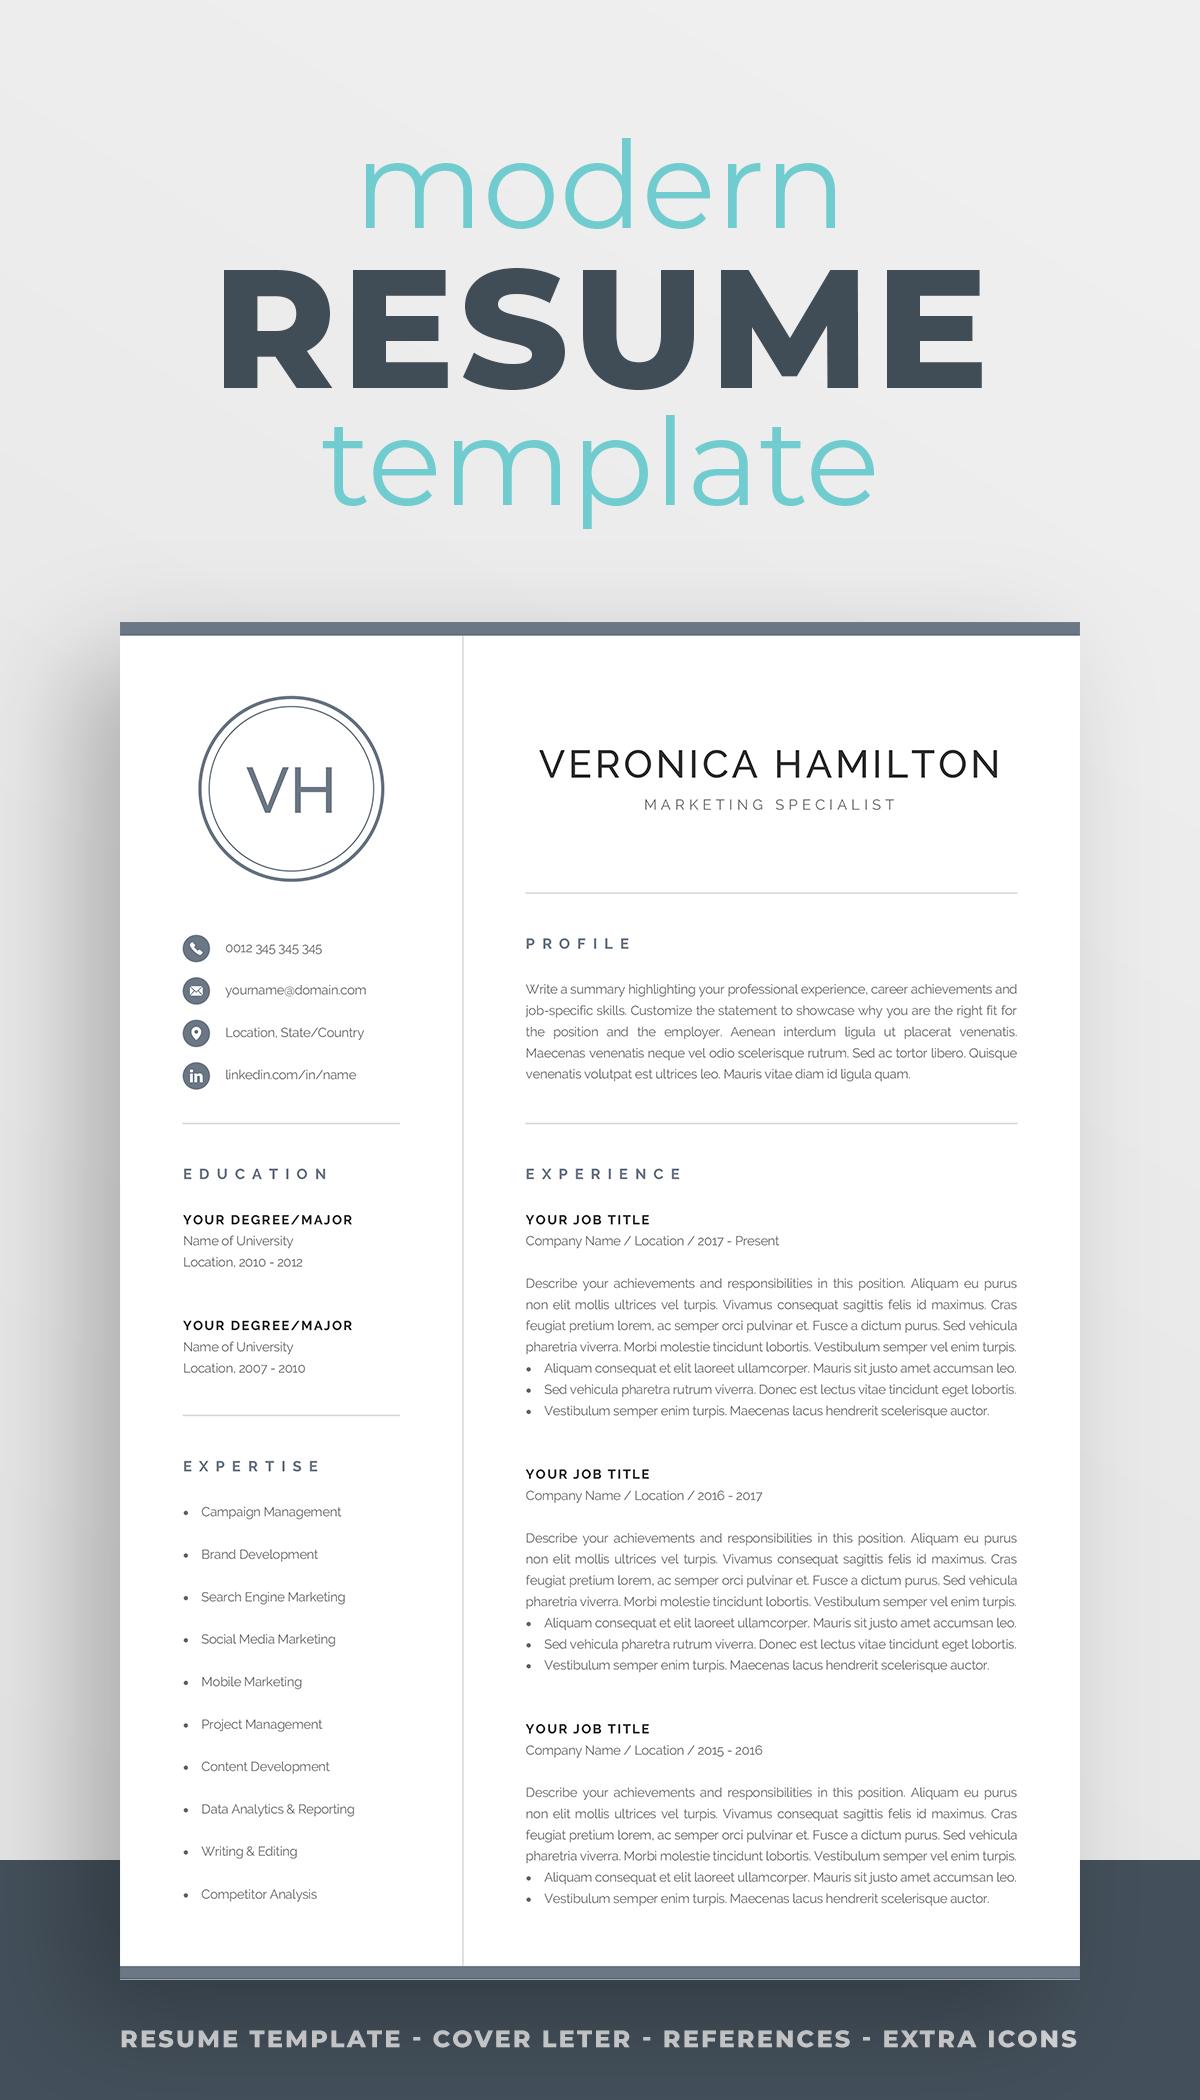 Resume Template With Monogram 1 2 Page Resume Modern Etsy In 2021 Resume Template Resume Template Professional Job Resume Template